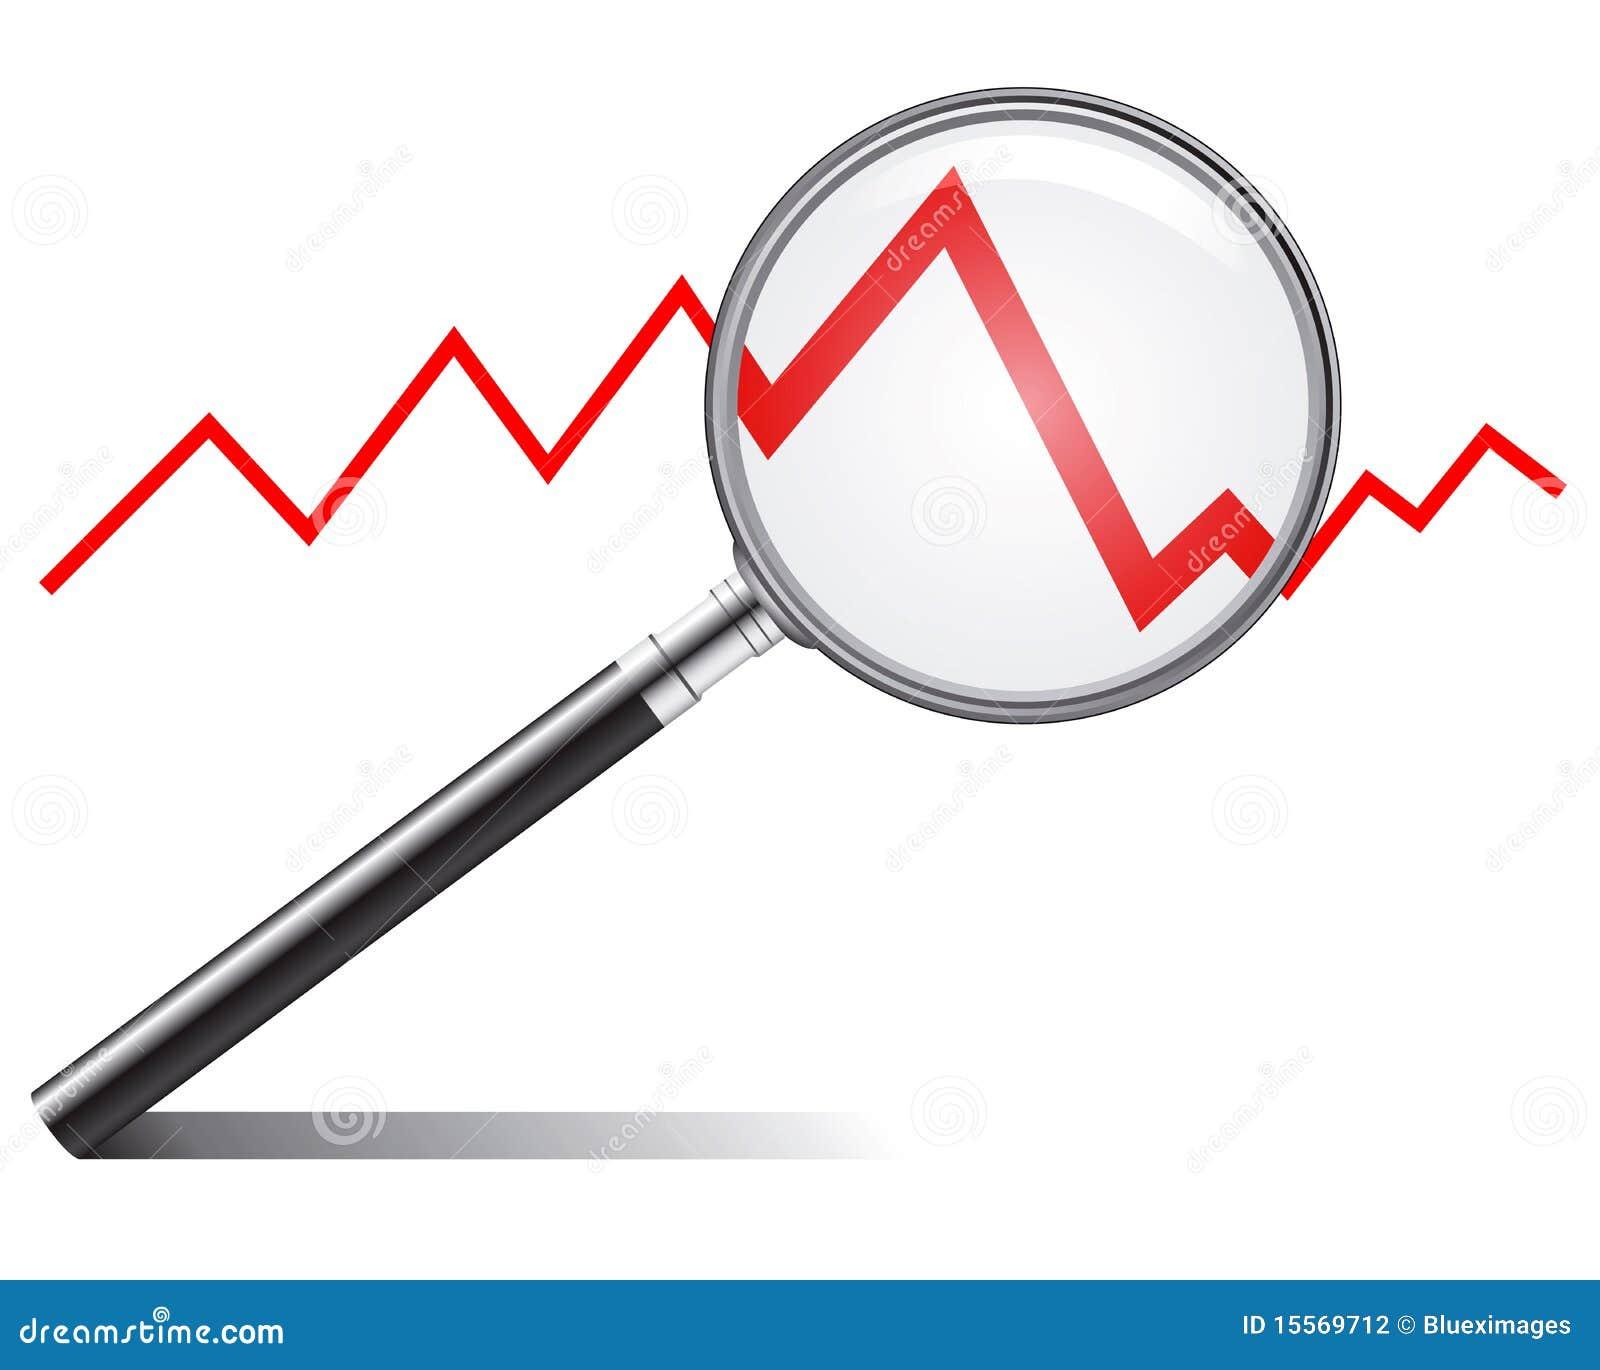 Line Art Design Trend : Sales trend stock vector illustration of descending